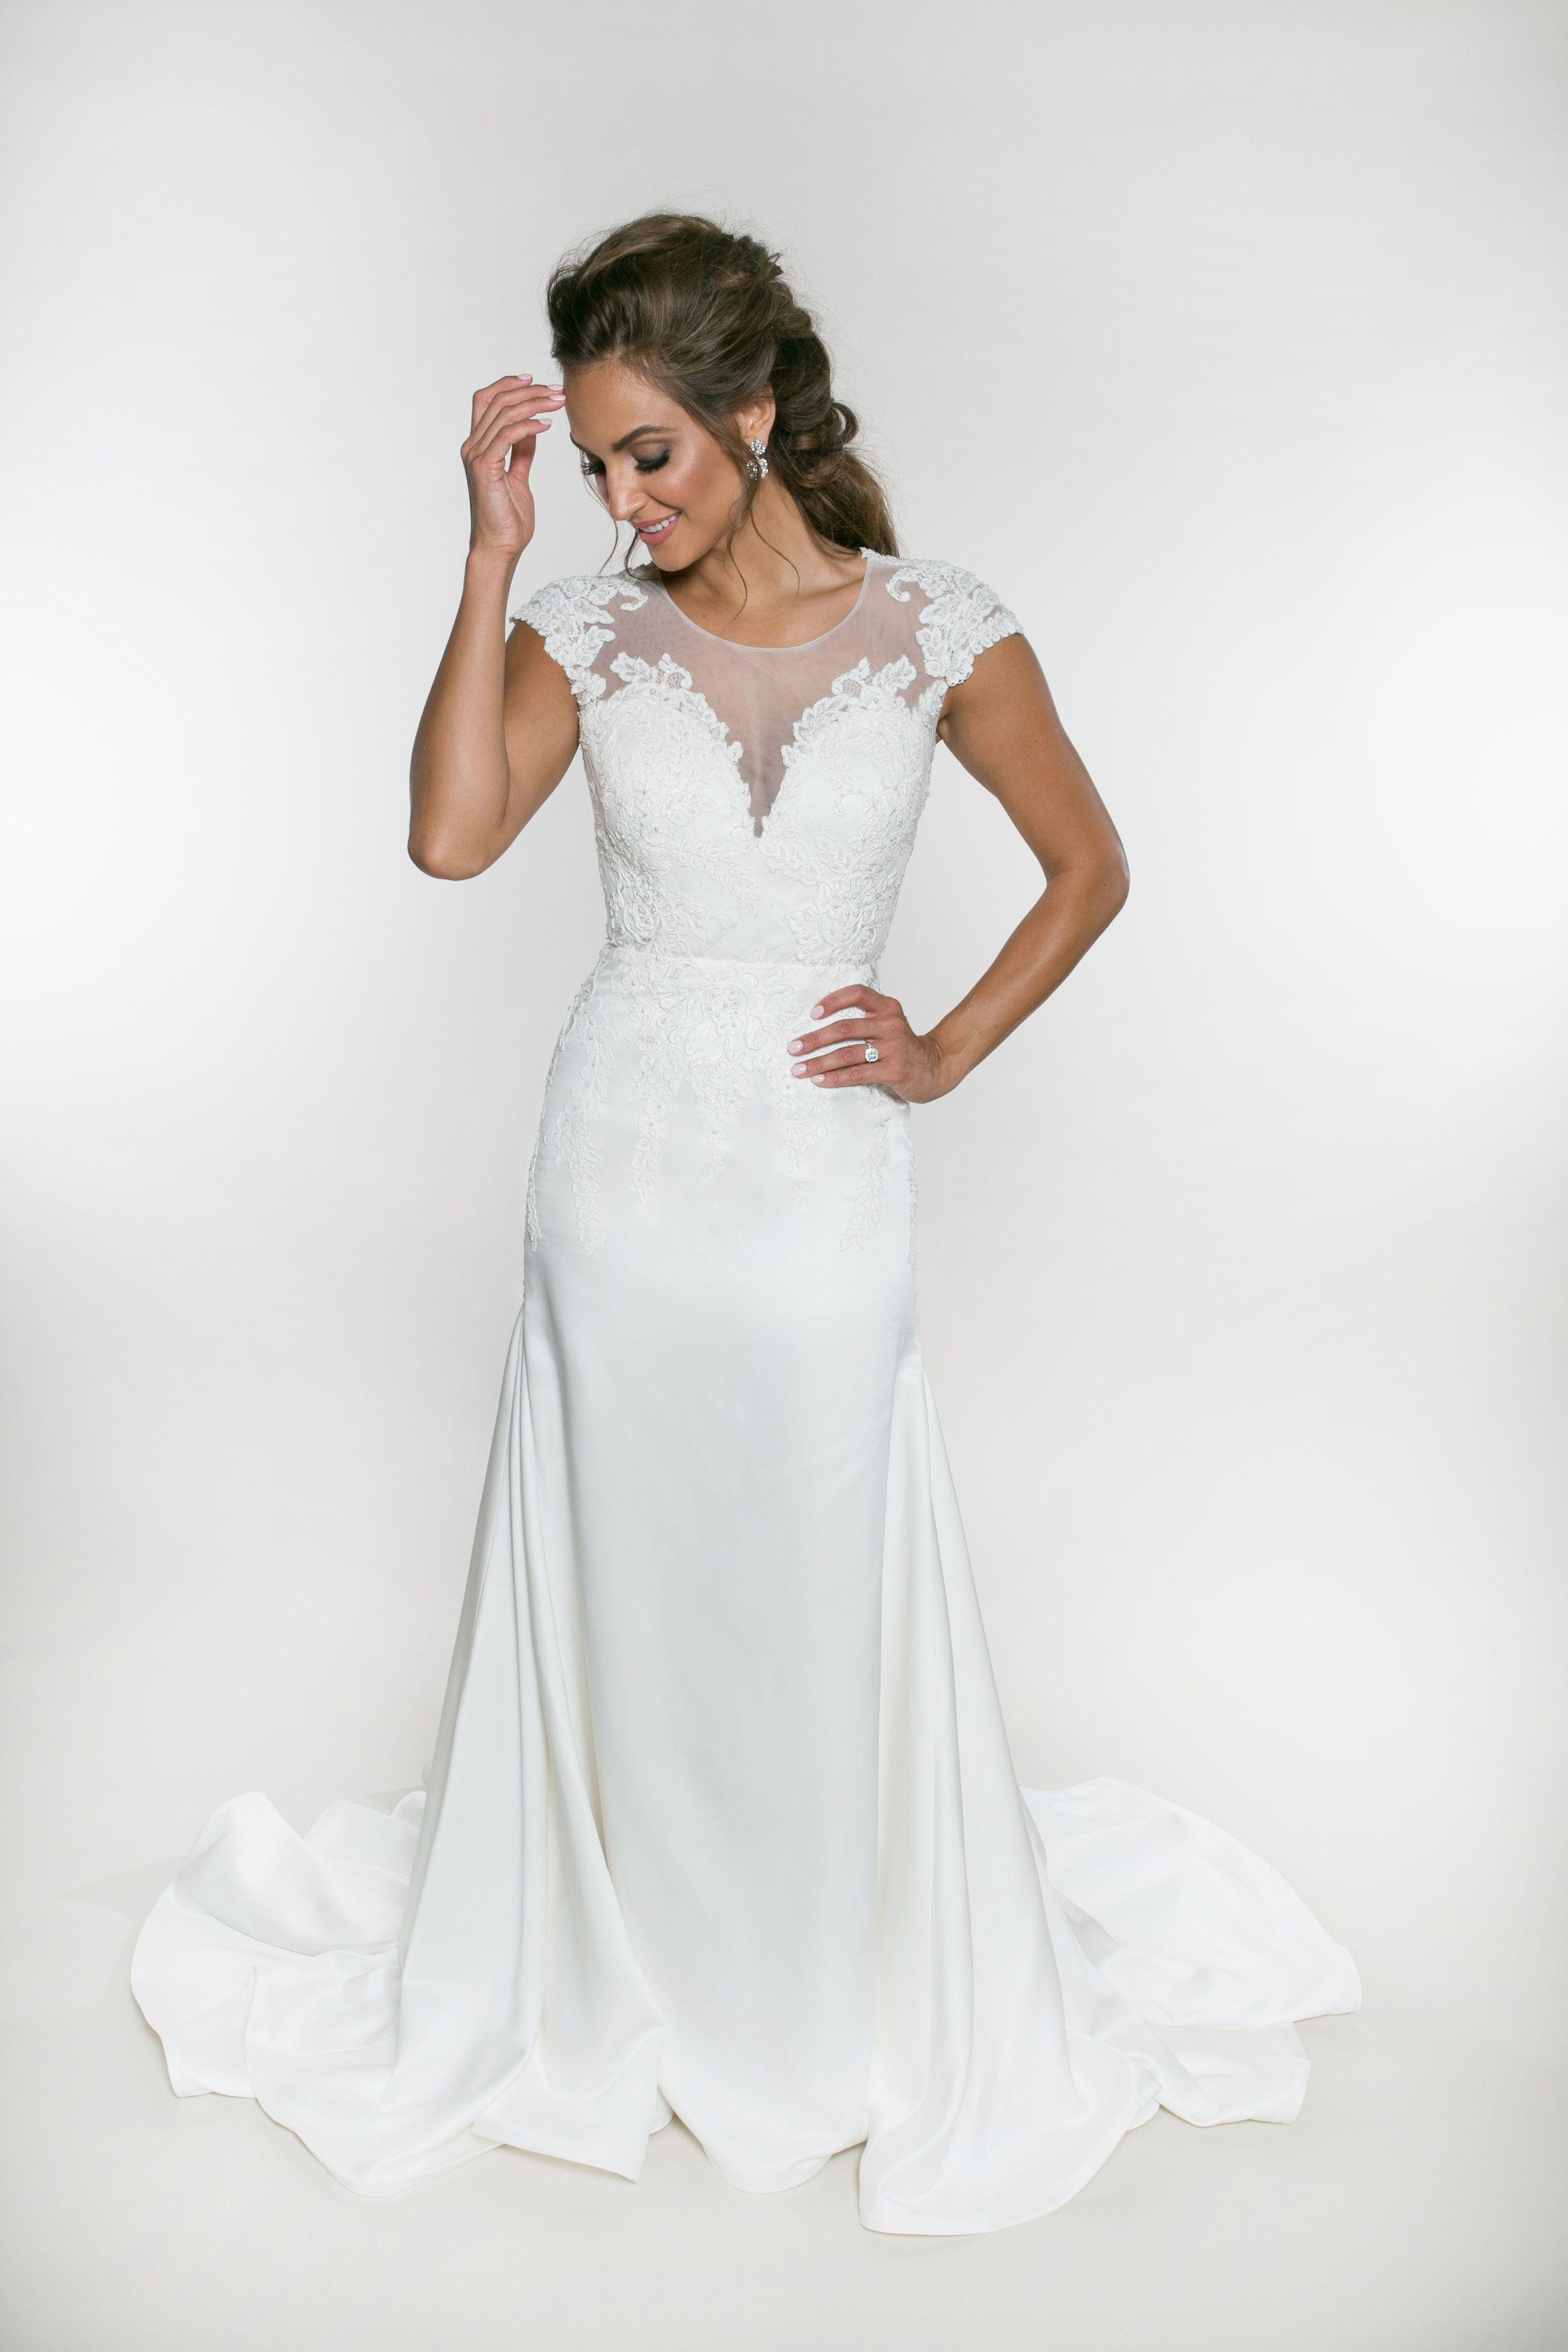 Regina Hall Heidi Elnora Atelier Lace Bodice Wedding Dress Wedding Dress Couture Illusion Wedding Dress